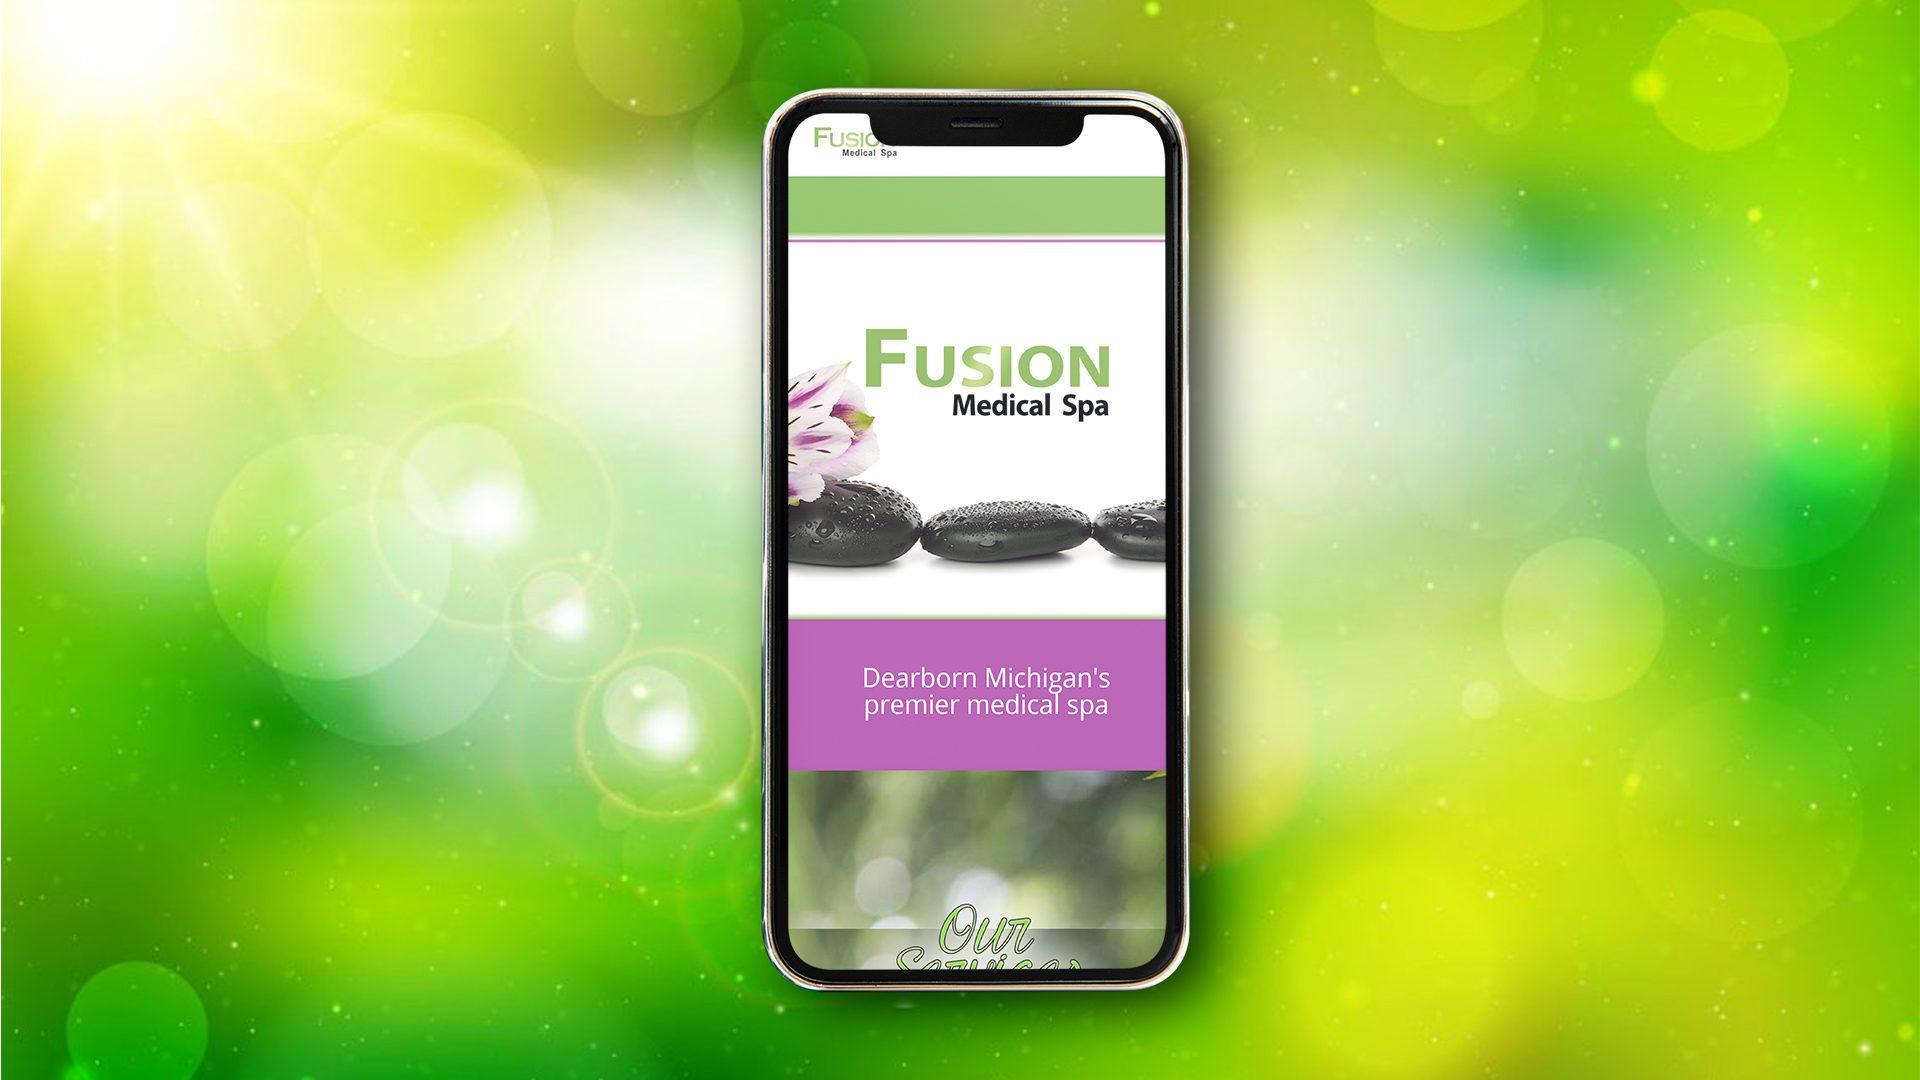 Fusion Spa - Website mockup 03